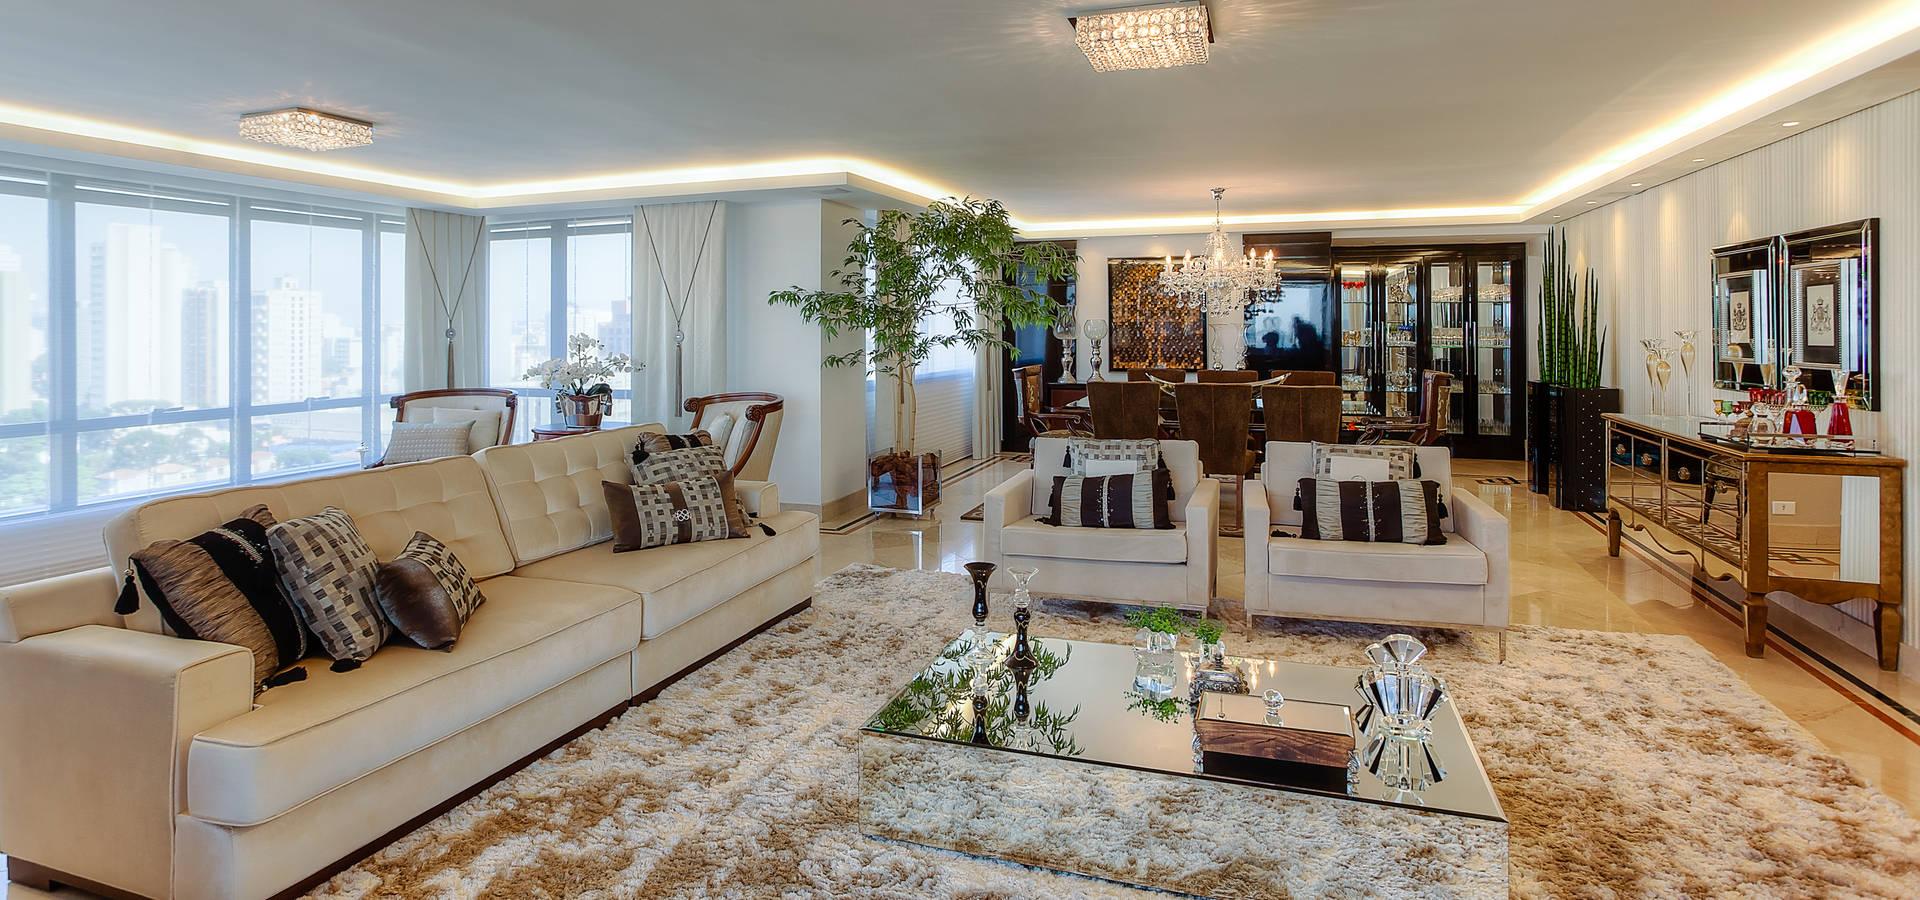 VL Arquitetura e Interiores